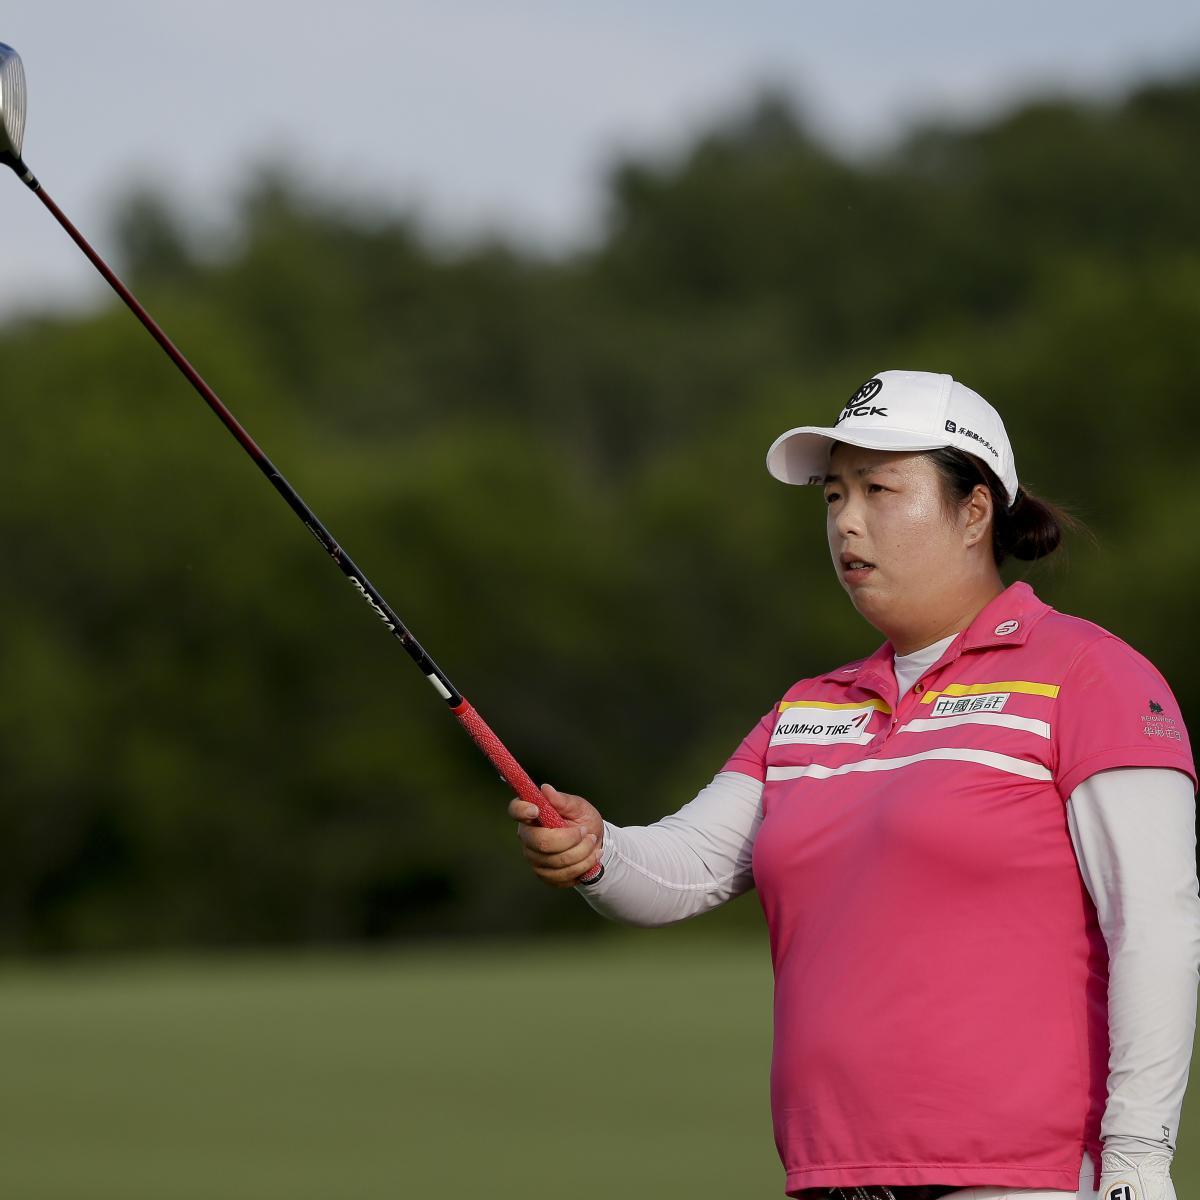 US Women's Open Golf 2017: Shanshan Feng Maintains Lead ...